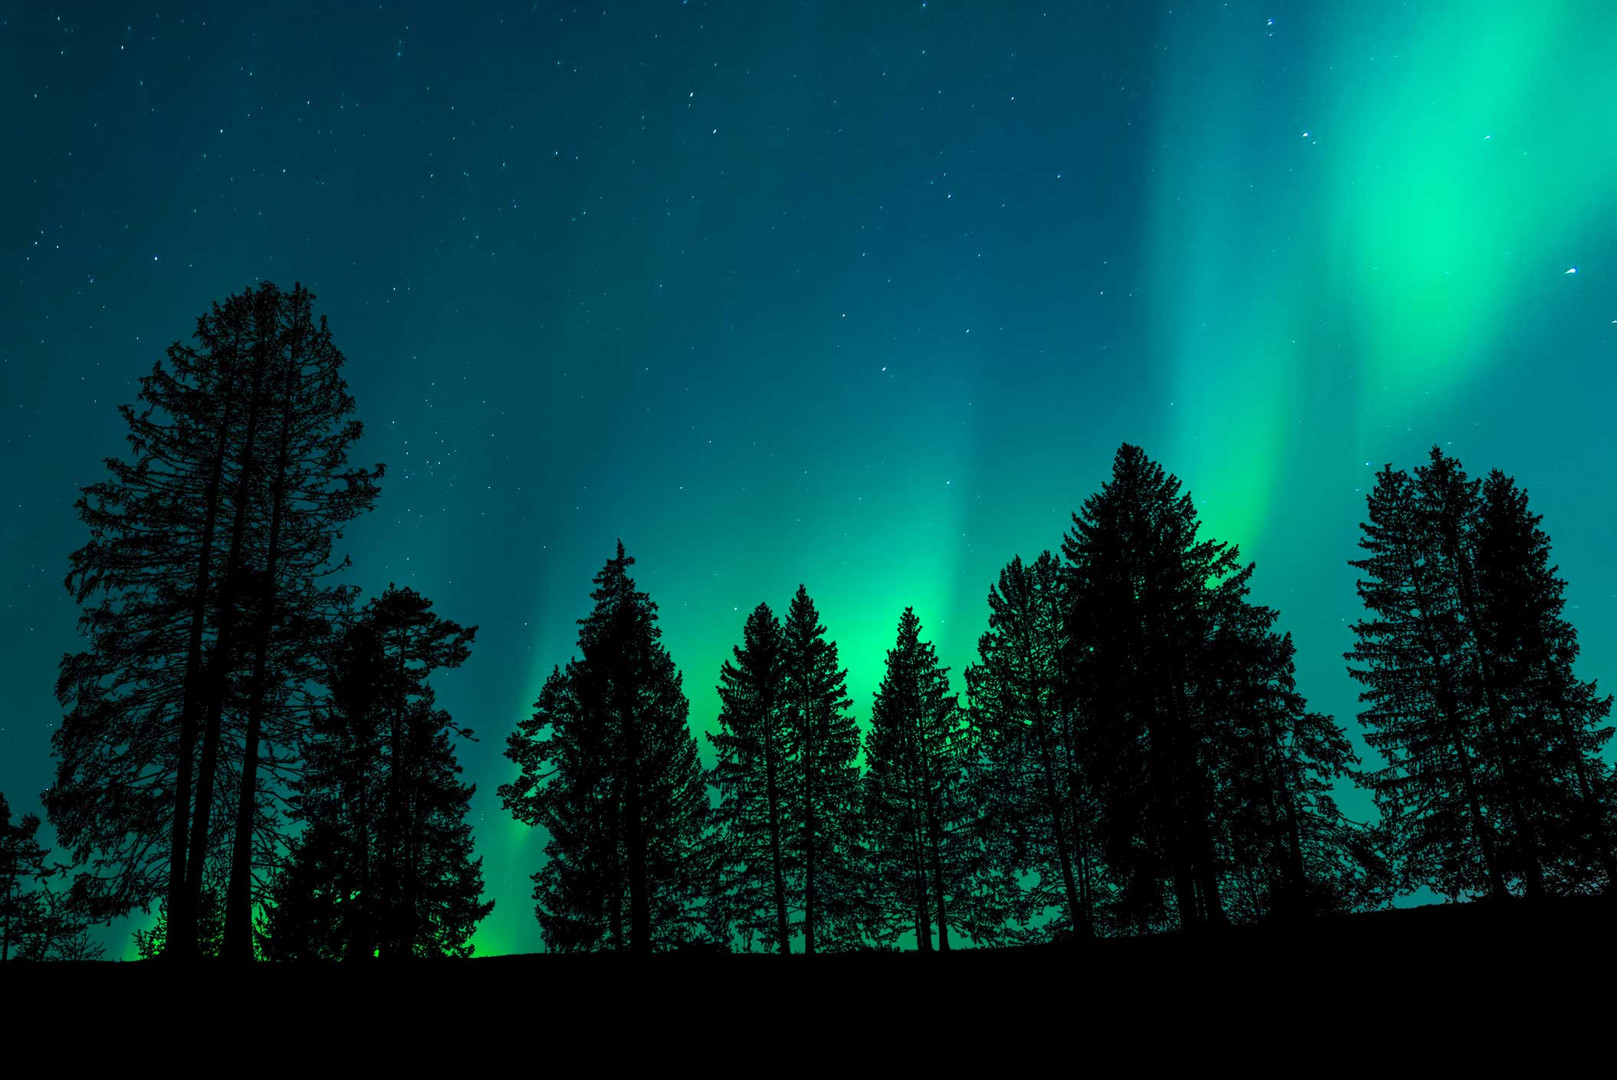 freepik-view-forest-with-night-sky.jpg